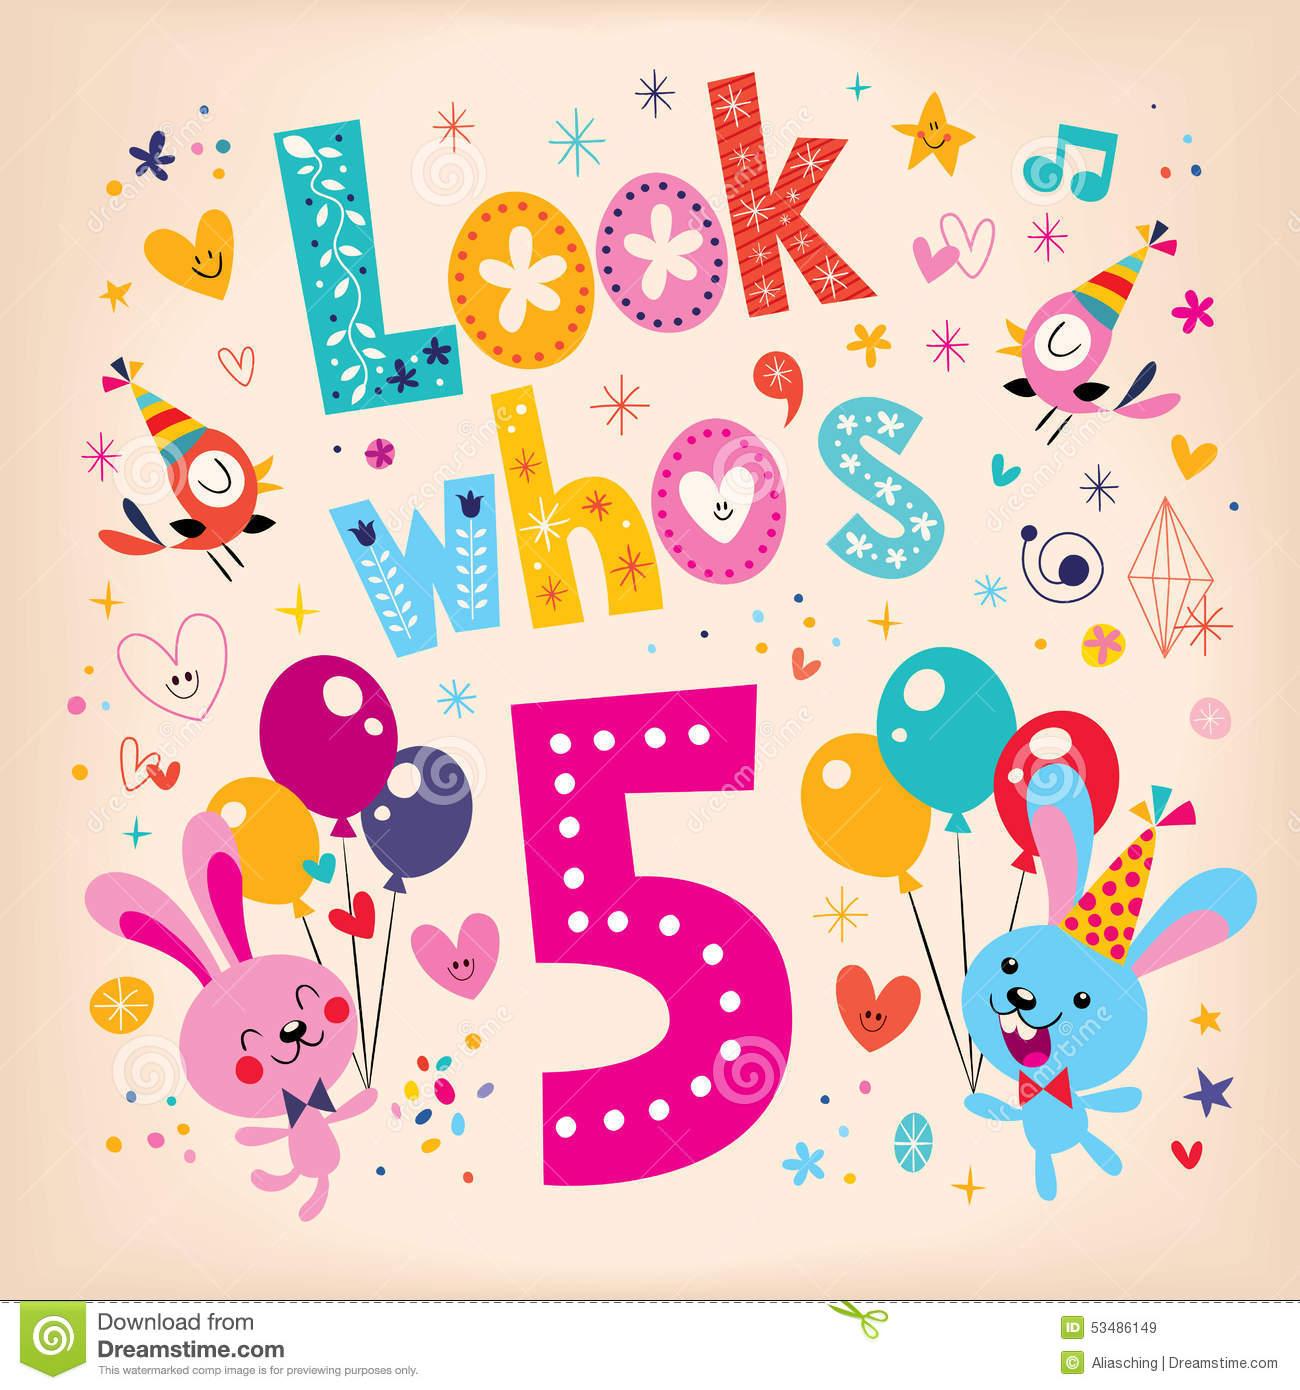 Awosme 5th Birthday Wishes 2016 Birthday Wishes Zone